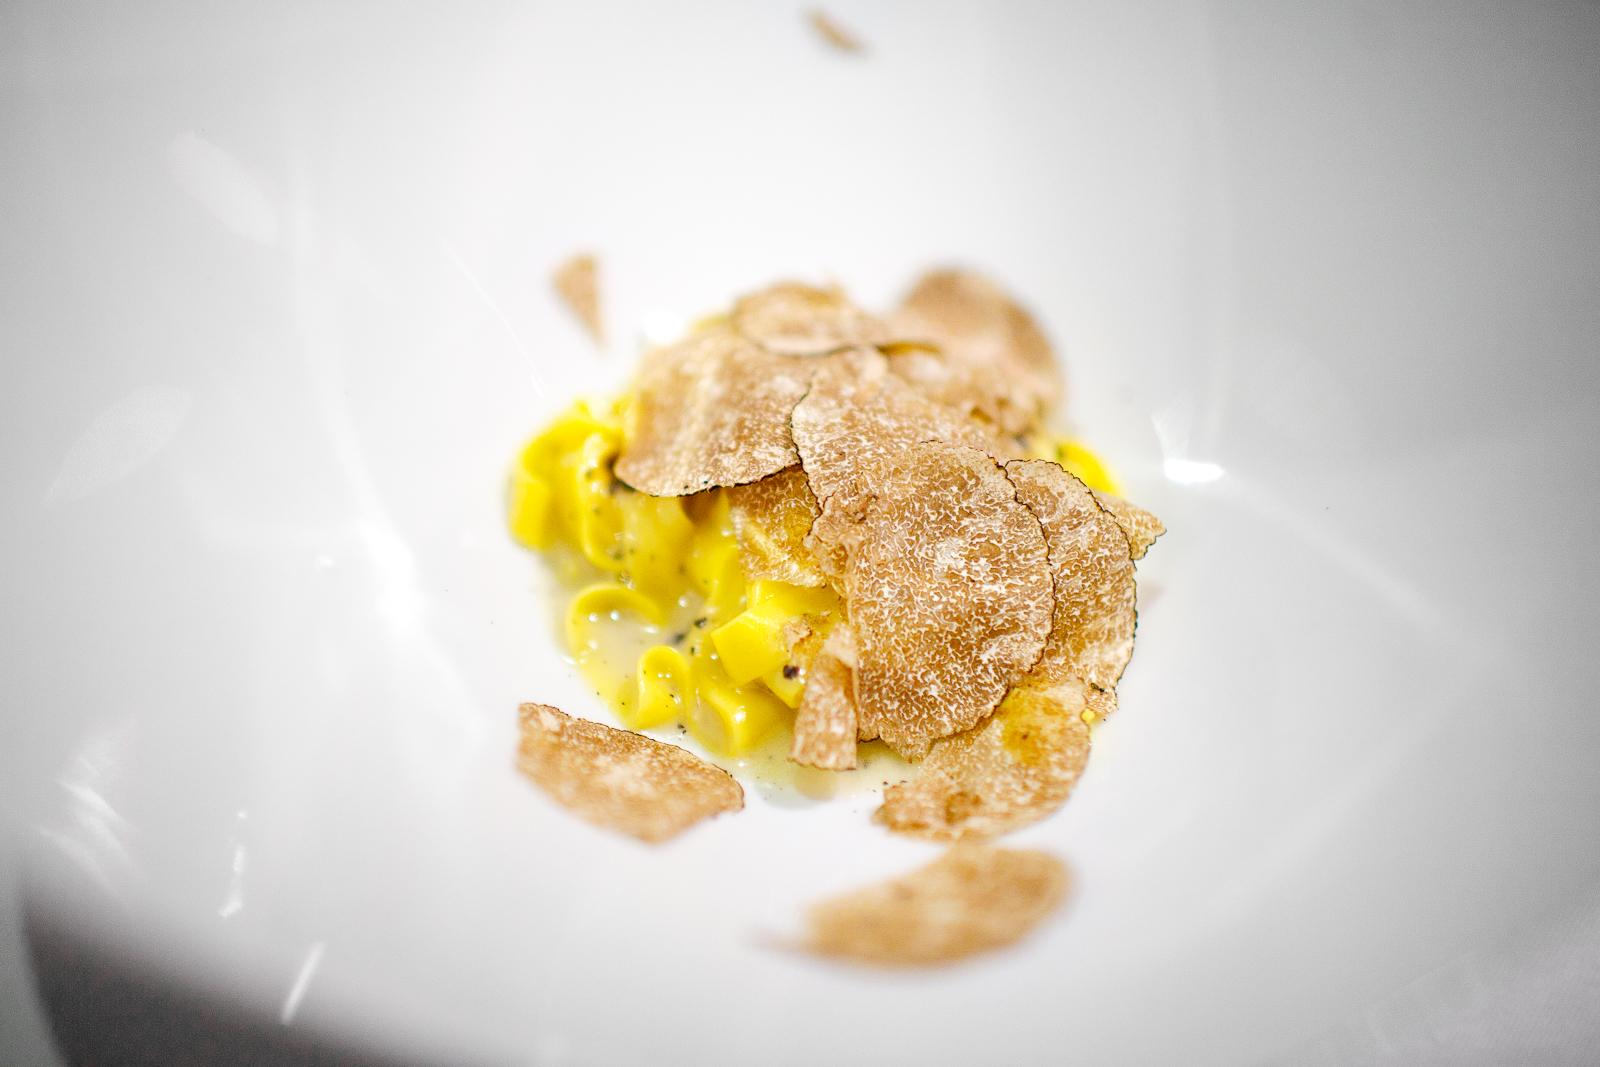 6th Course: Hand-cut tagliatelle with white truffle